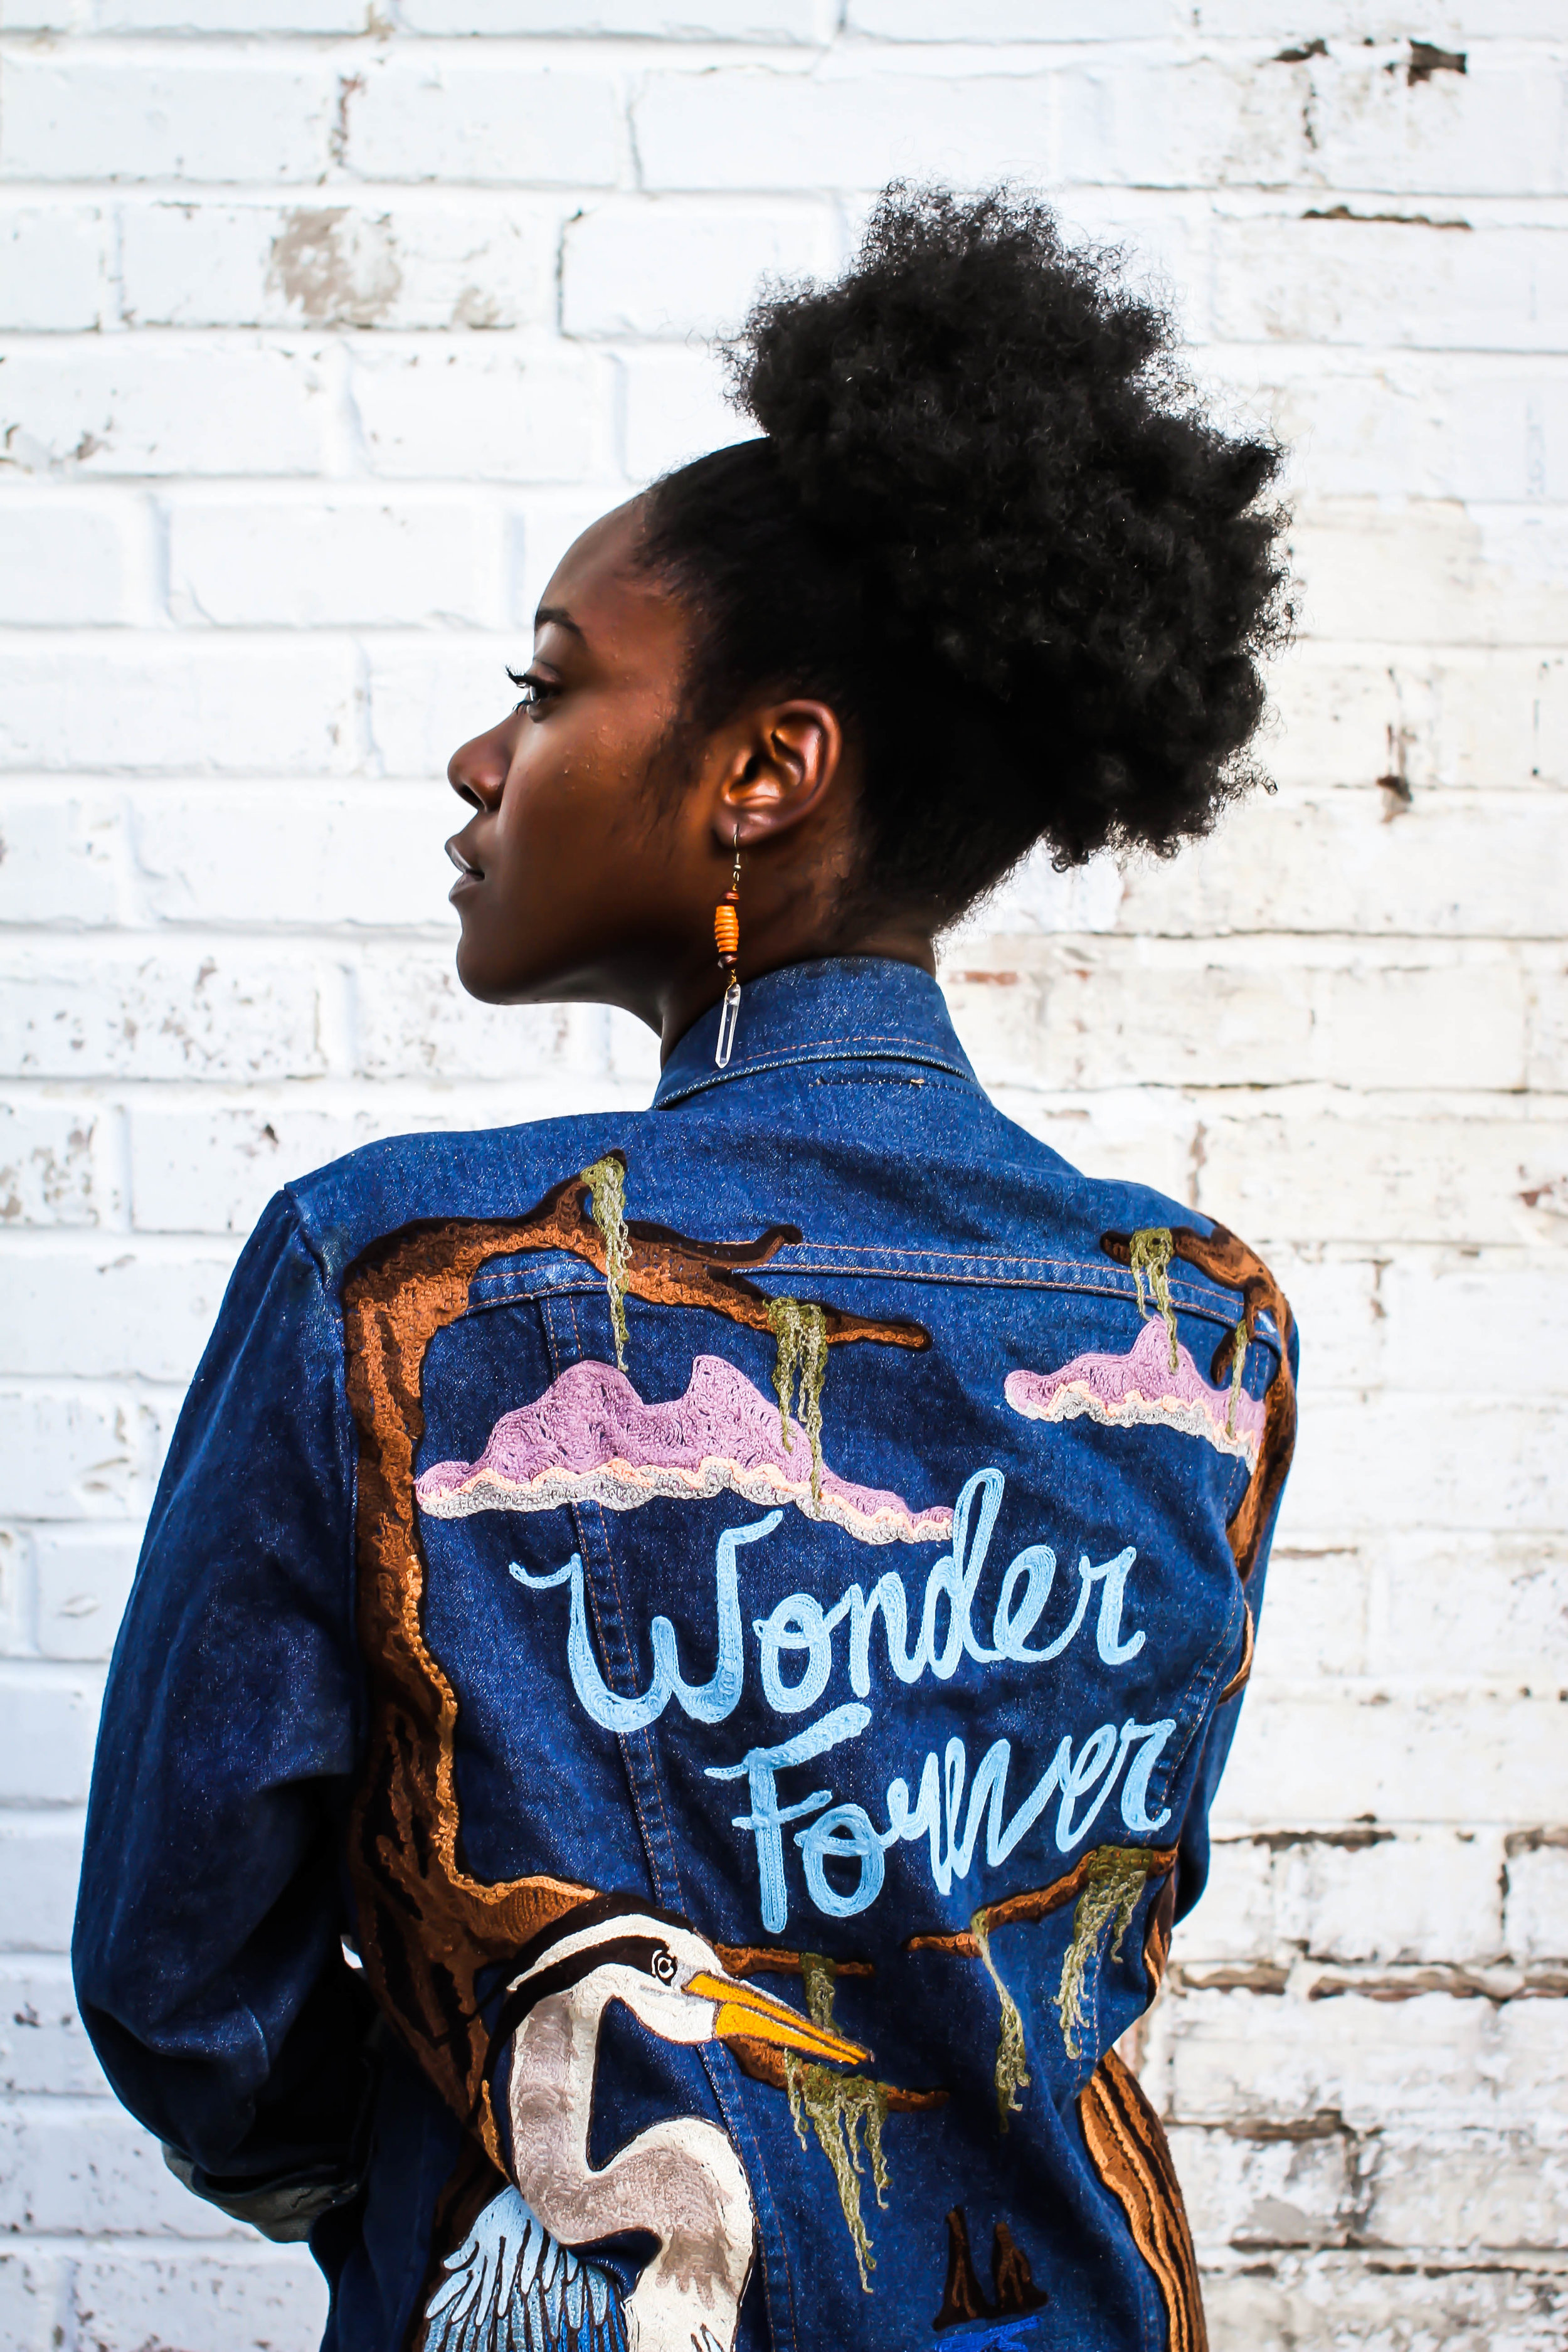 Chloe Marie Johnson for Wonder South.